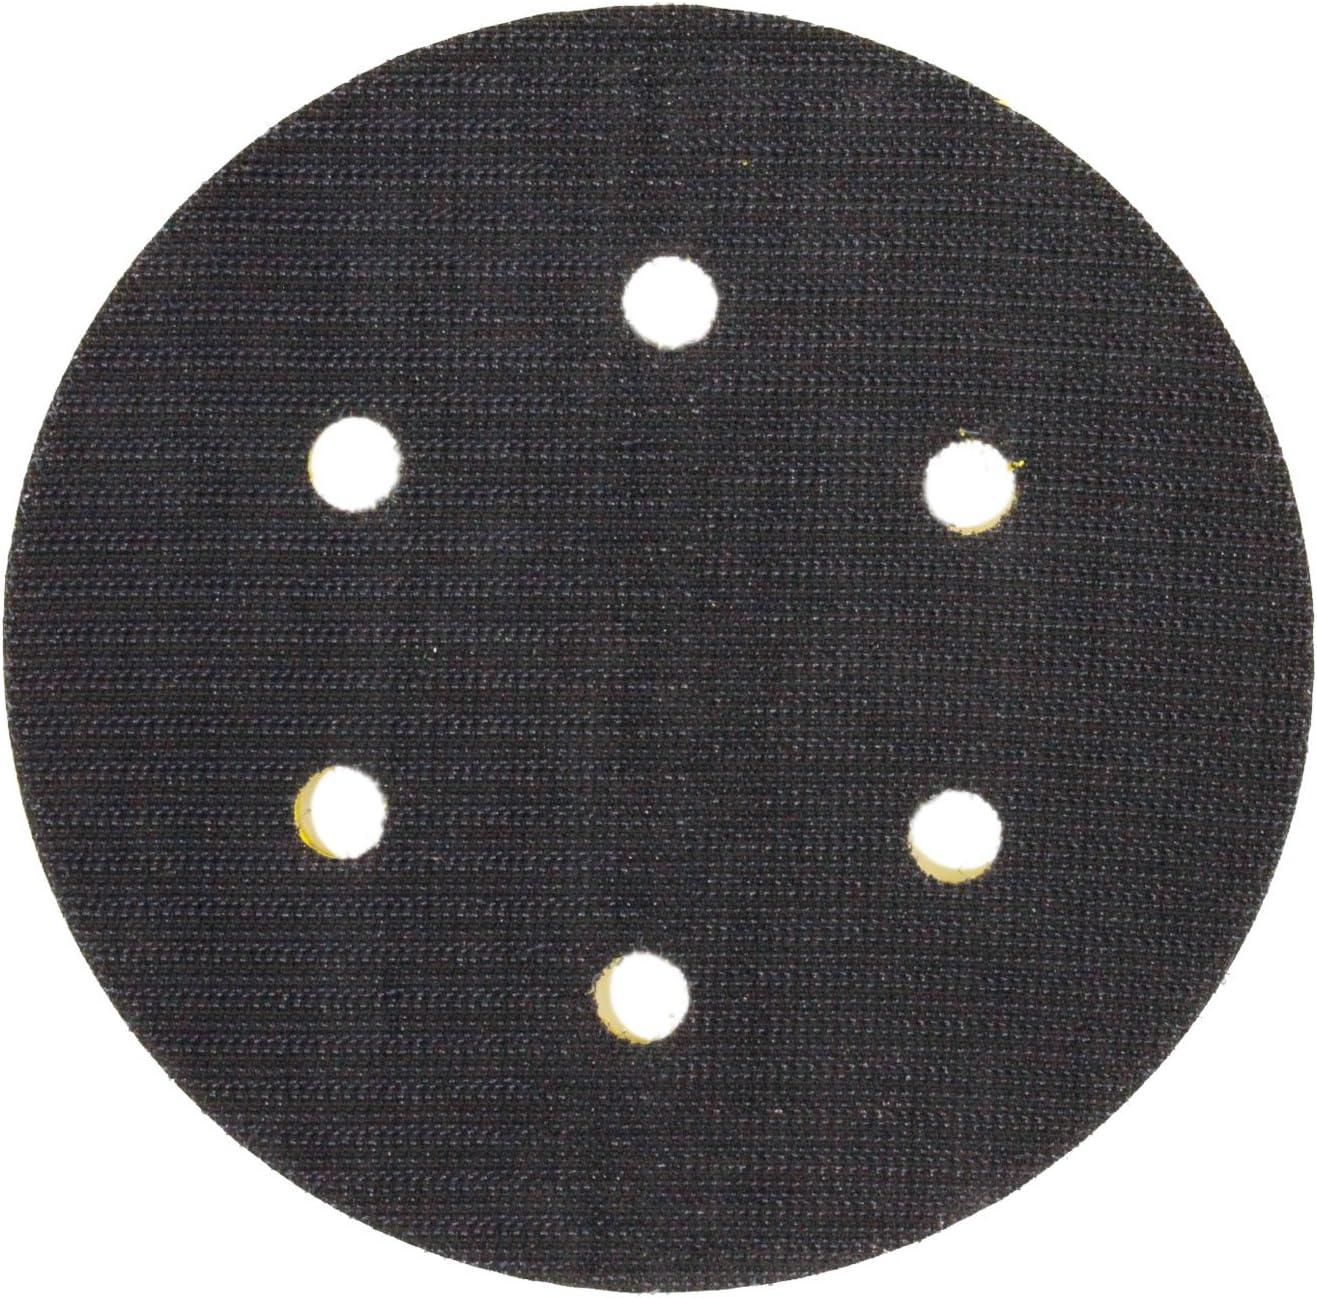 Dual Action Random Orbital 6 Hole Hook /& Loop Face TCP Global 6 DA Polisher /& Sander Pad